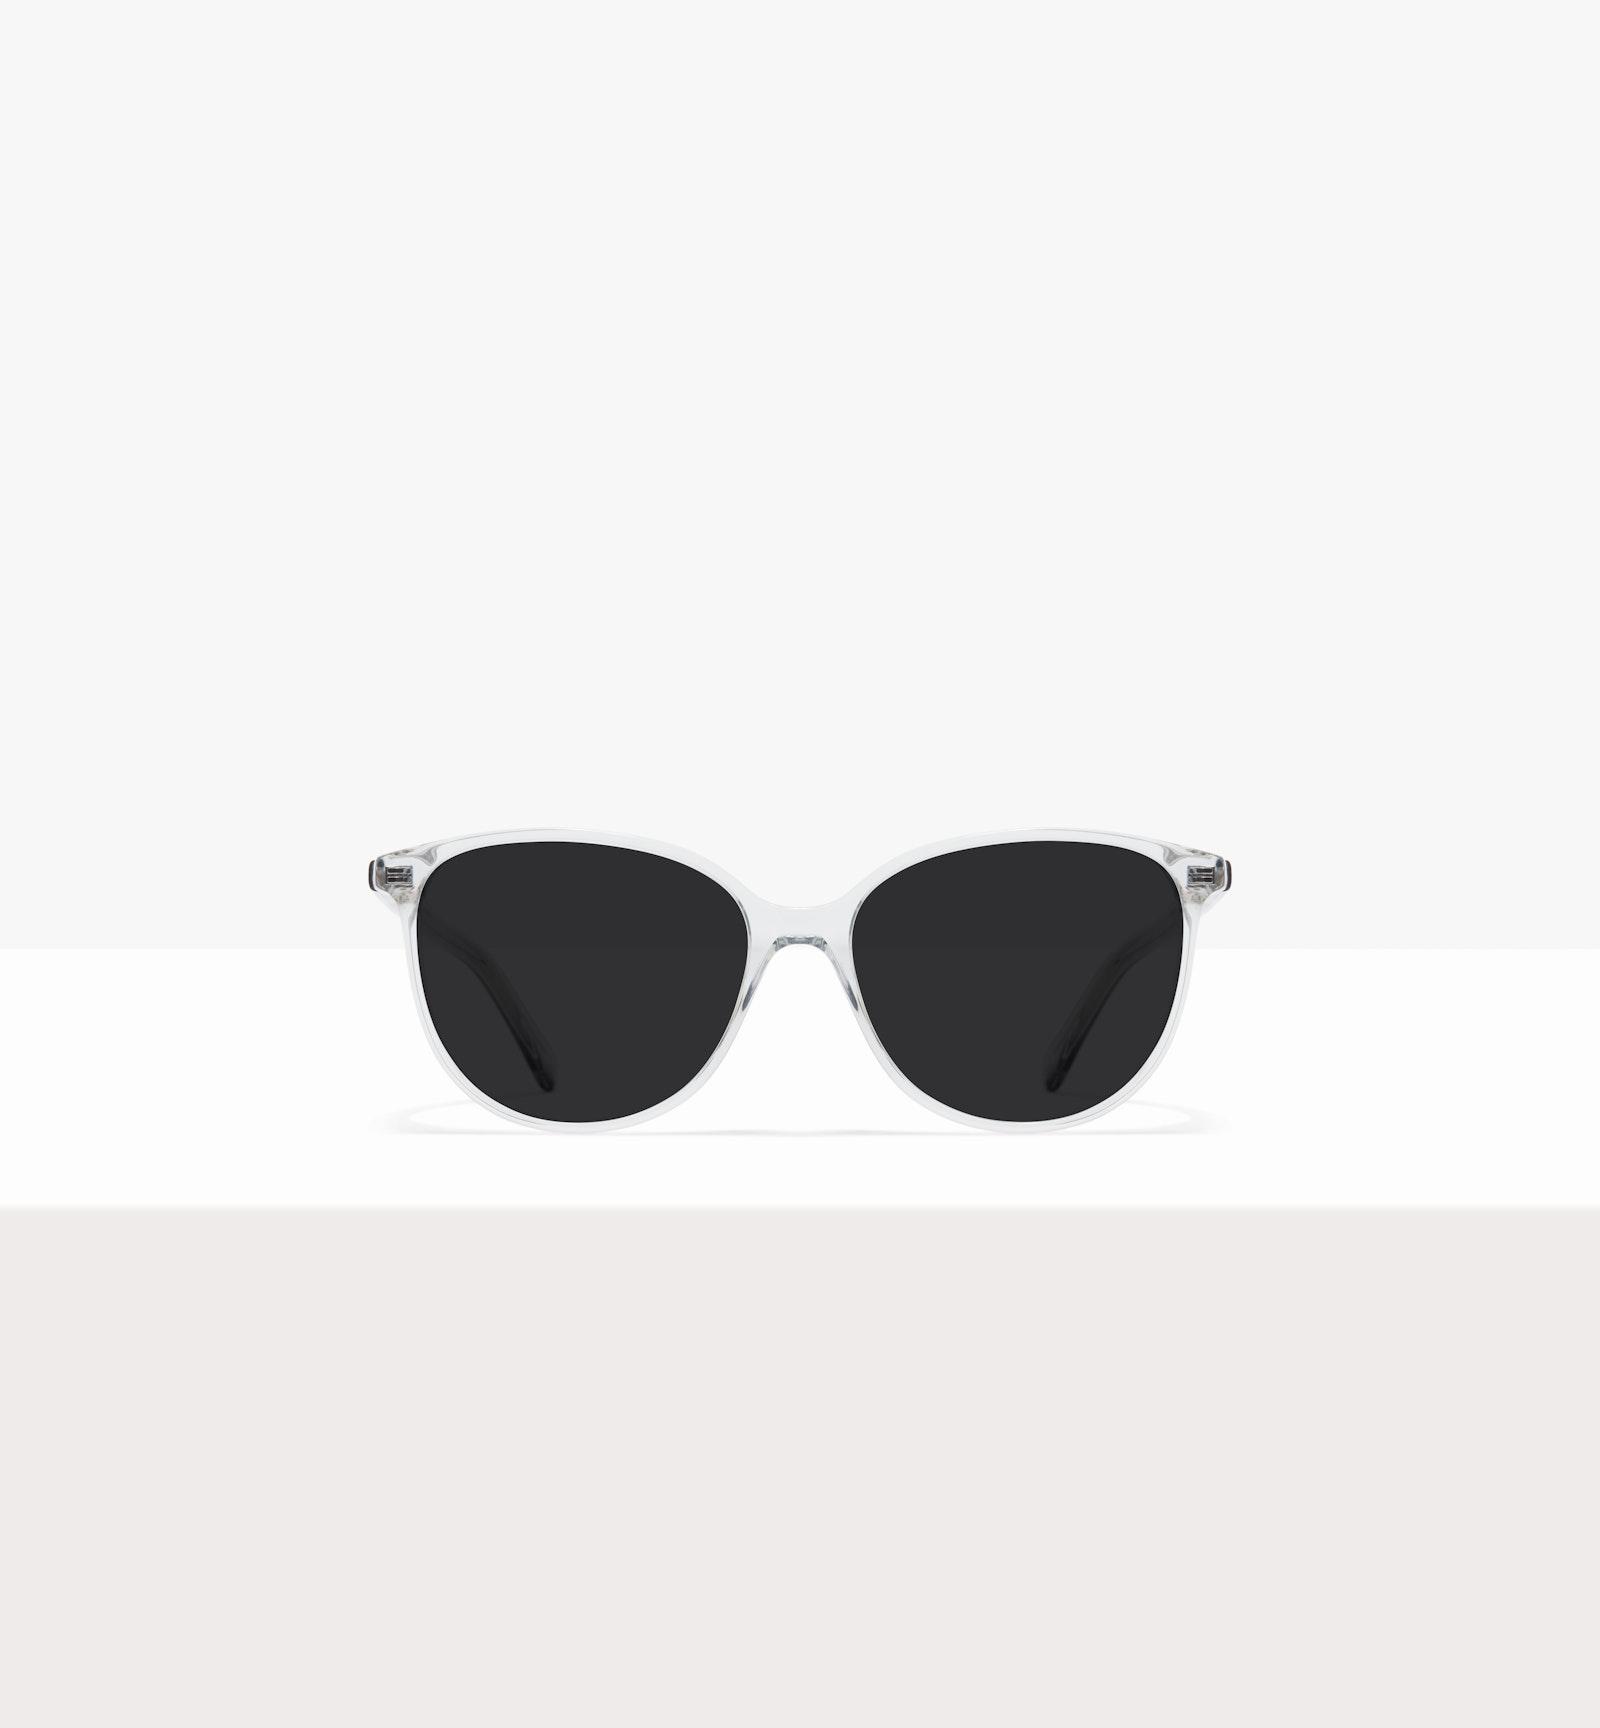 Affordable Fashion Glasses Cat Eye Sunglasses Women Imagine M Taupe